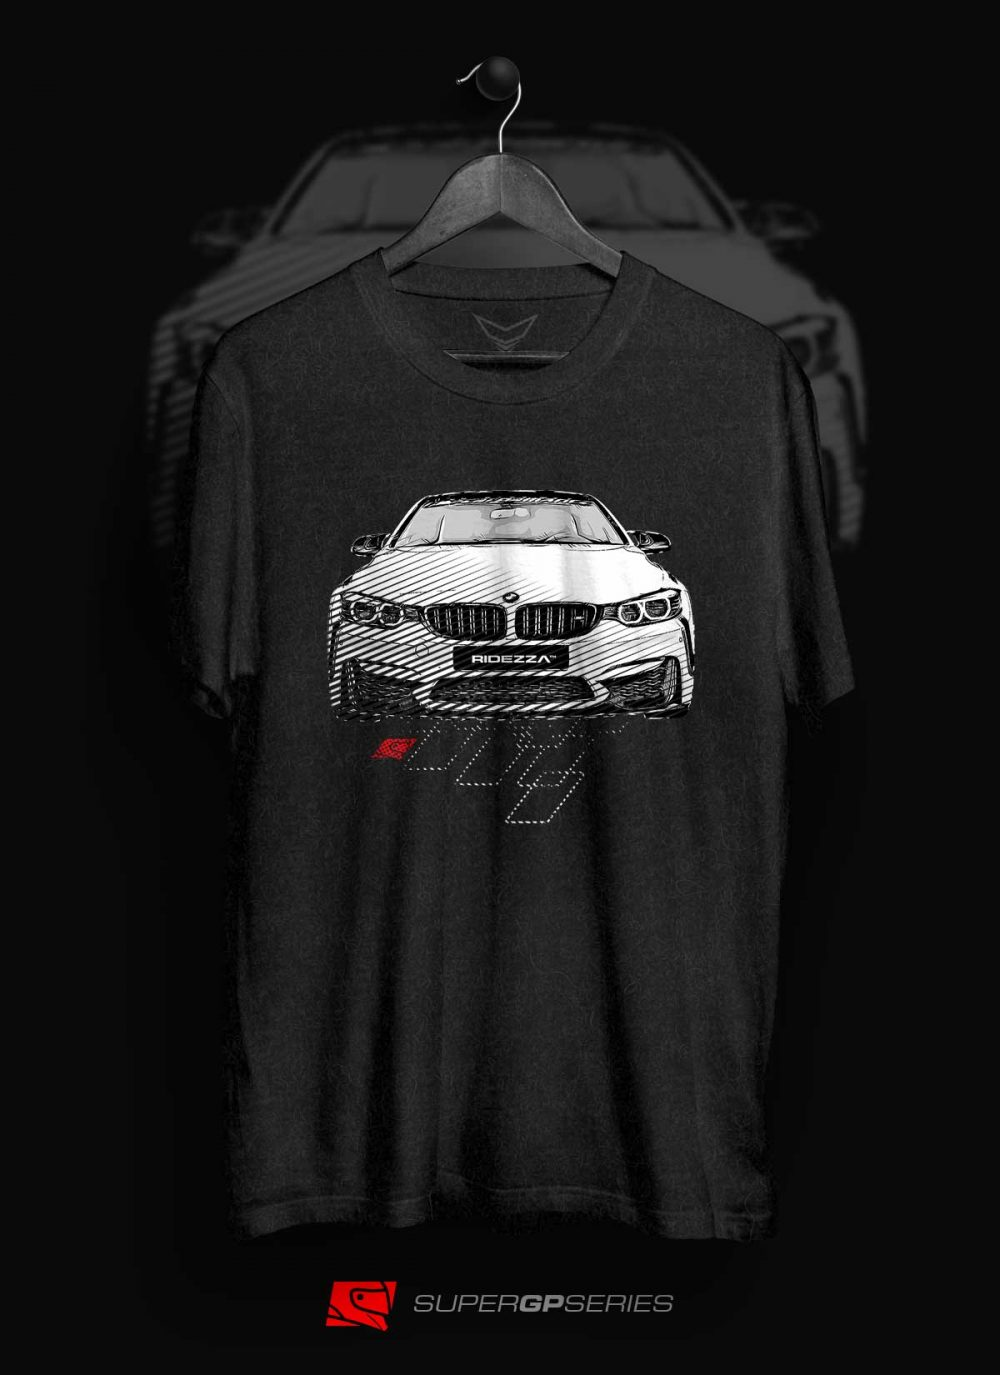 BMW M4 SuperGP Series T-Shirt